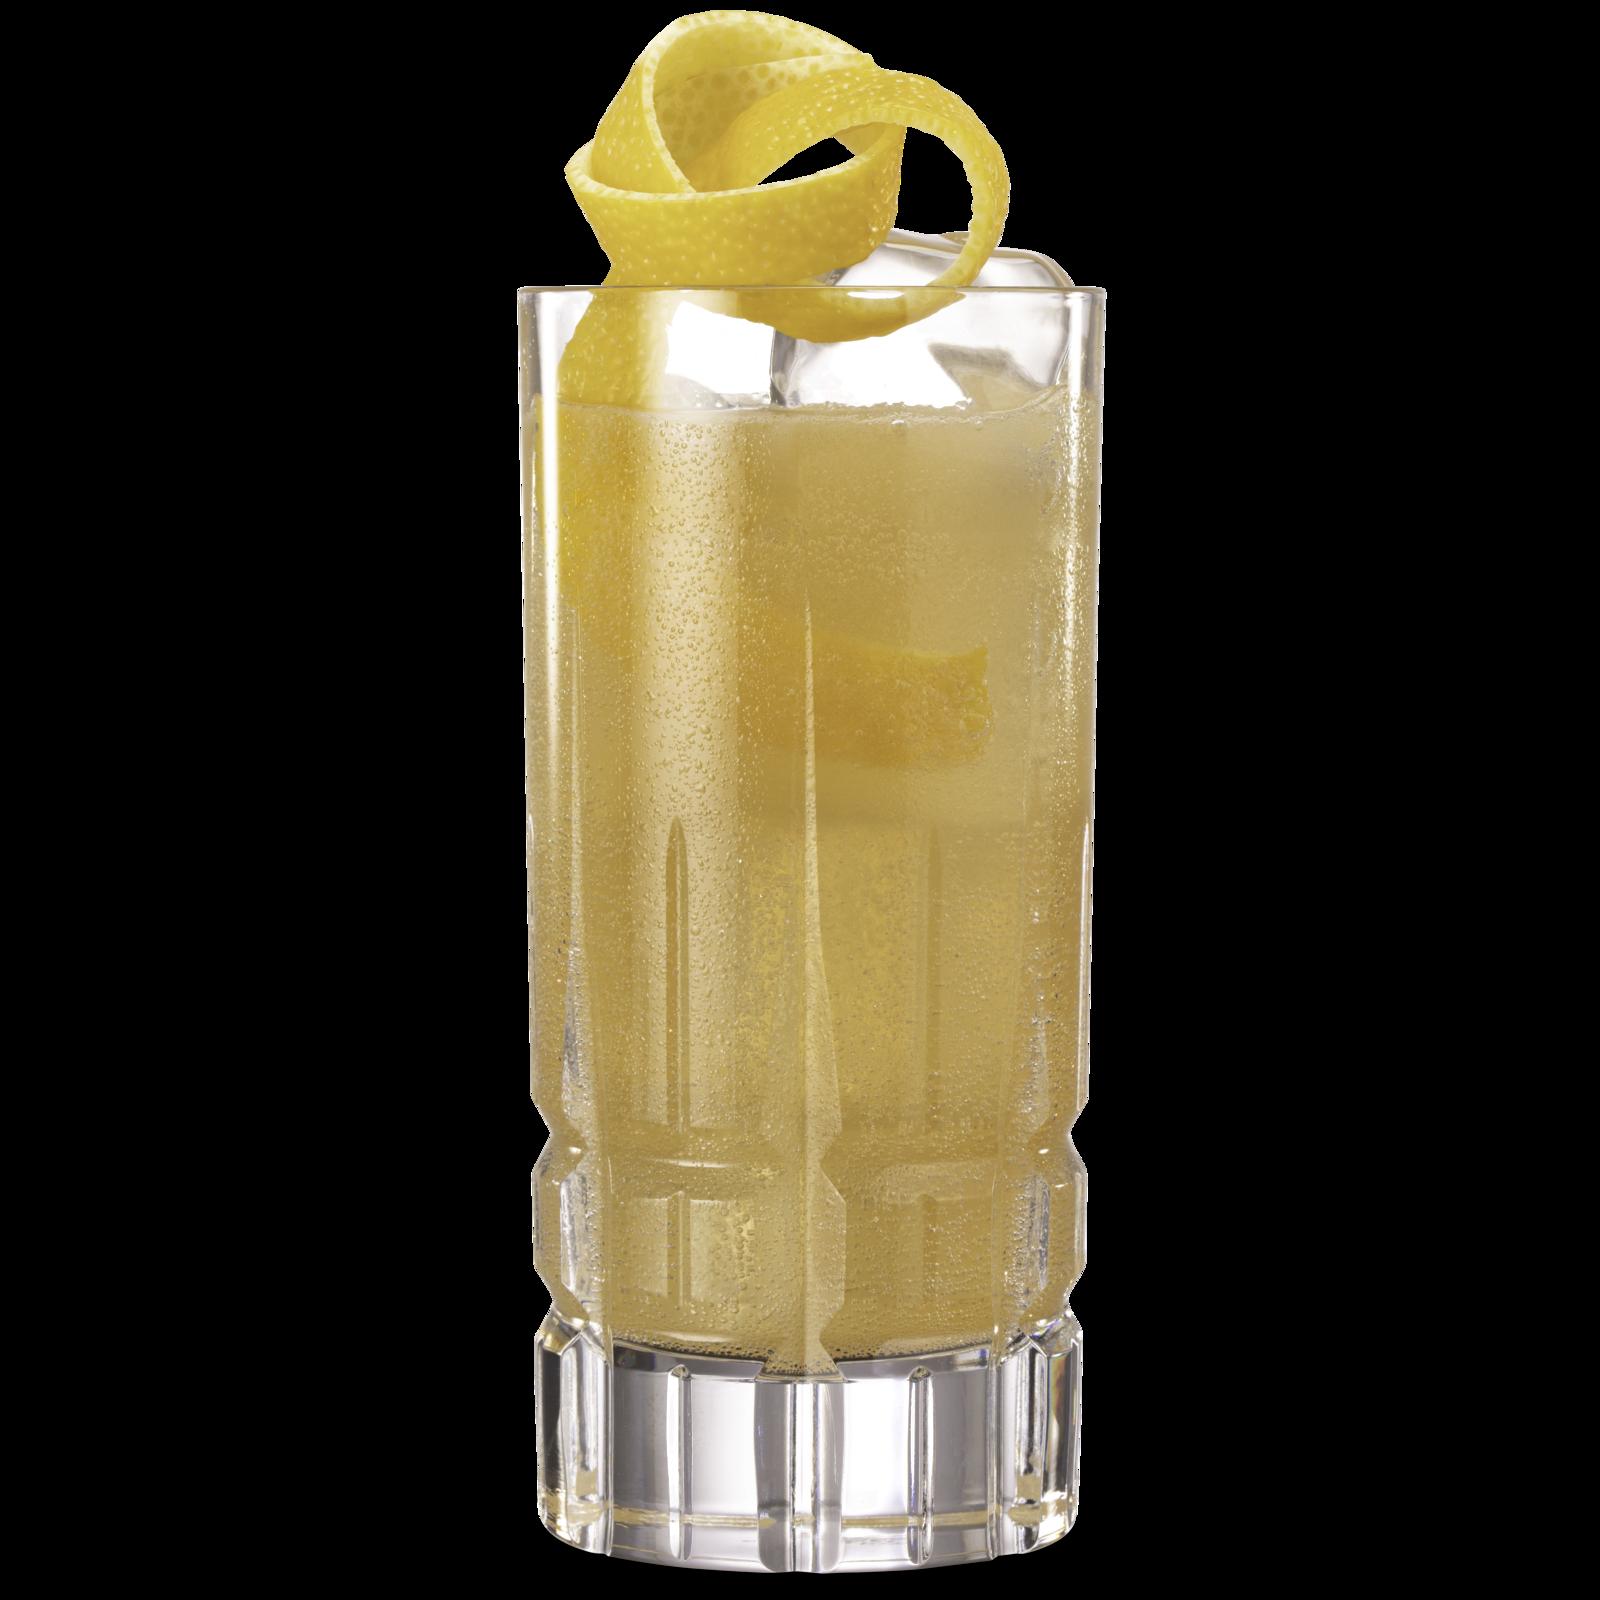 Spiced Pear & Elderflower Collins